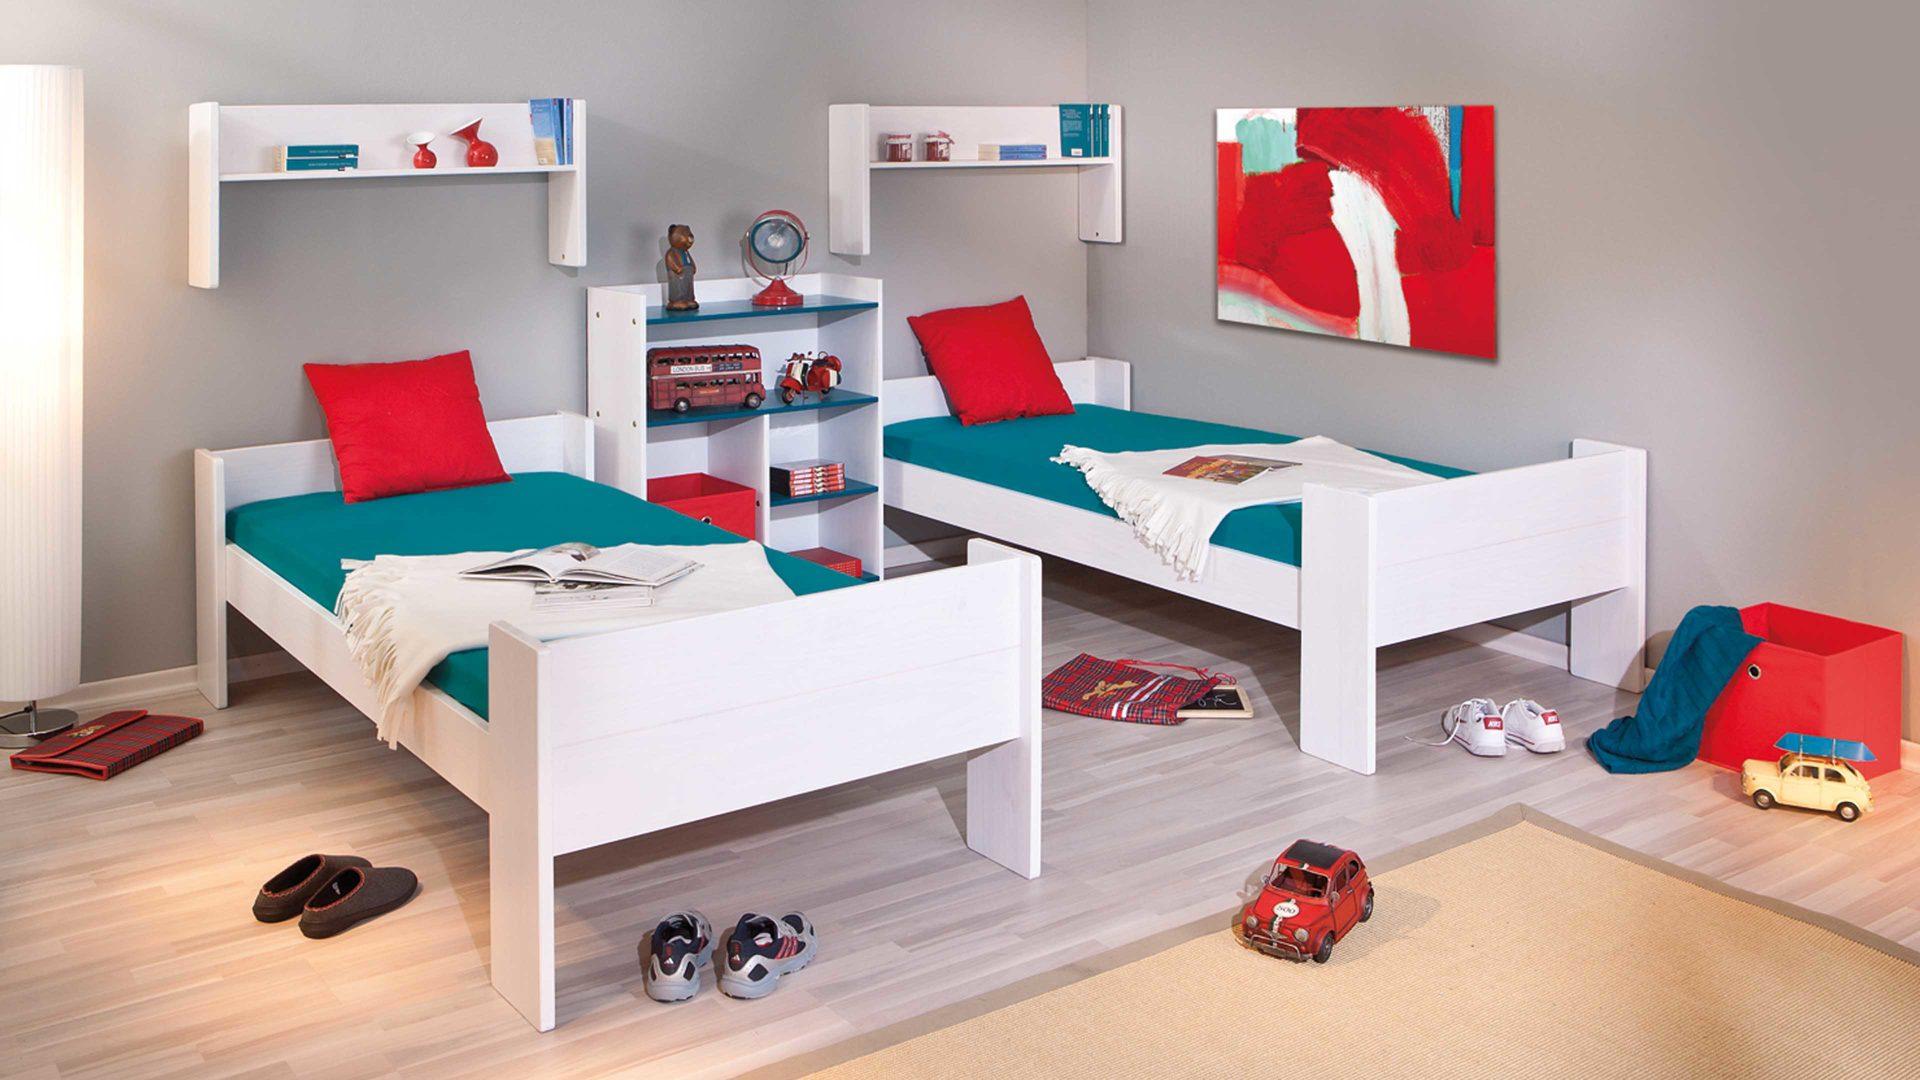 Paidi Etagenbett Weiss : Etagenbett dream well ein kinderhochbett aus massivem